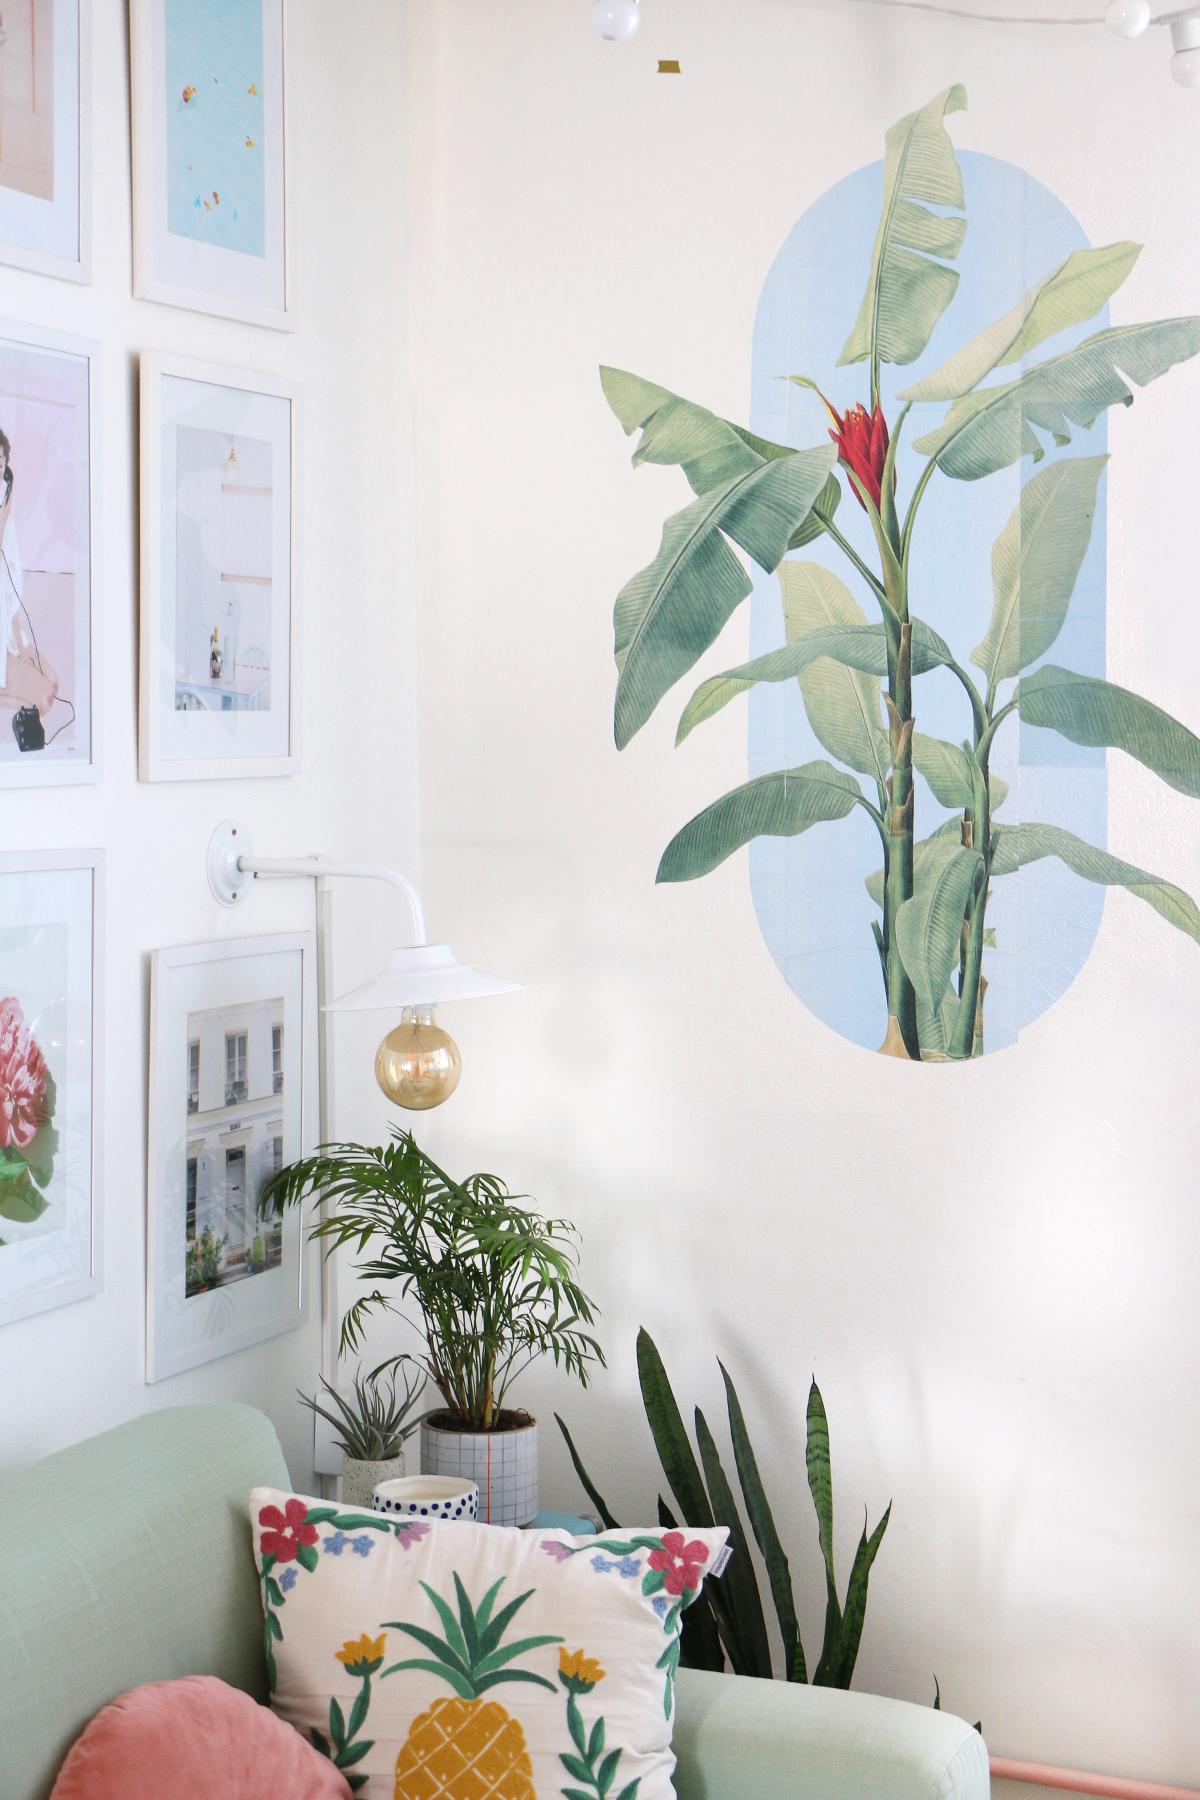 lambe lambe parede sala como fazer onde comprar - kit cartazes lambe lambe botanica floral banana